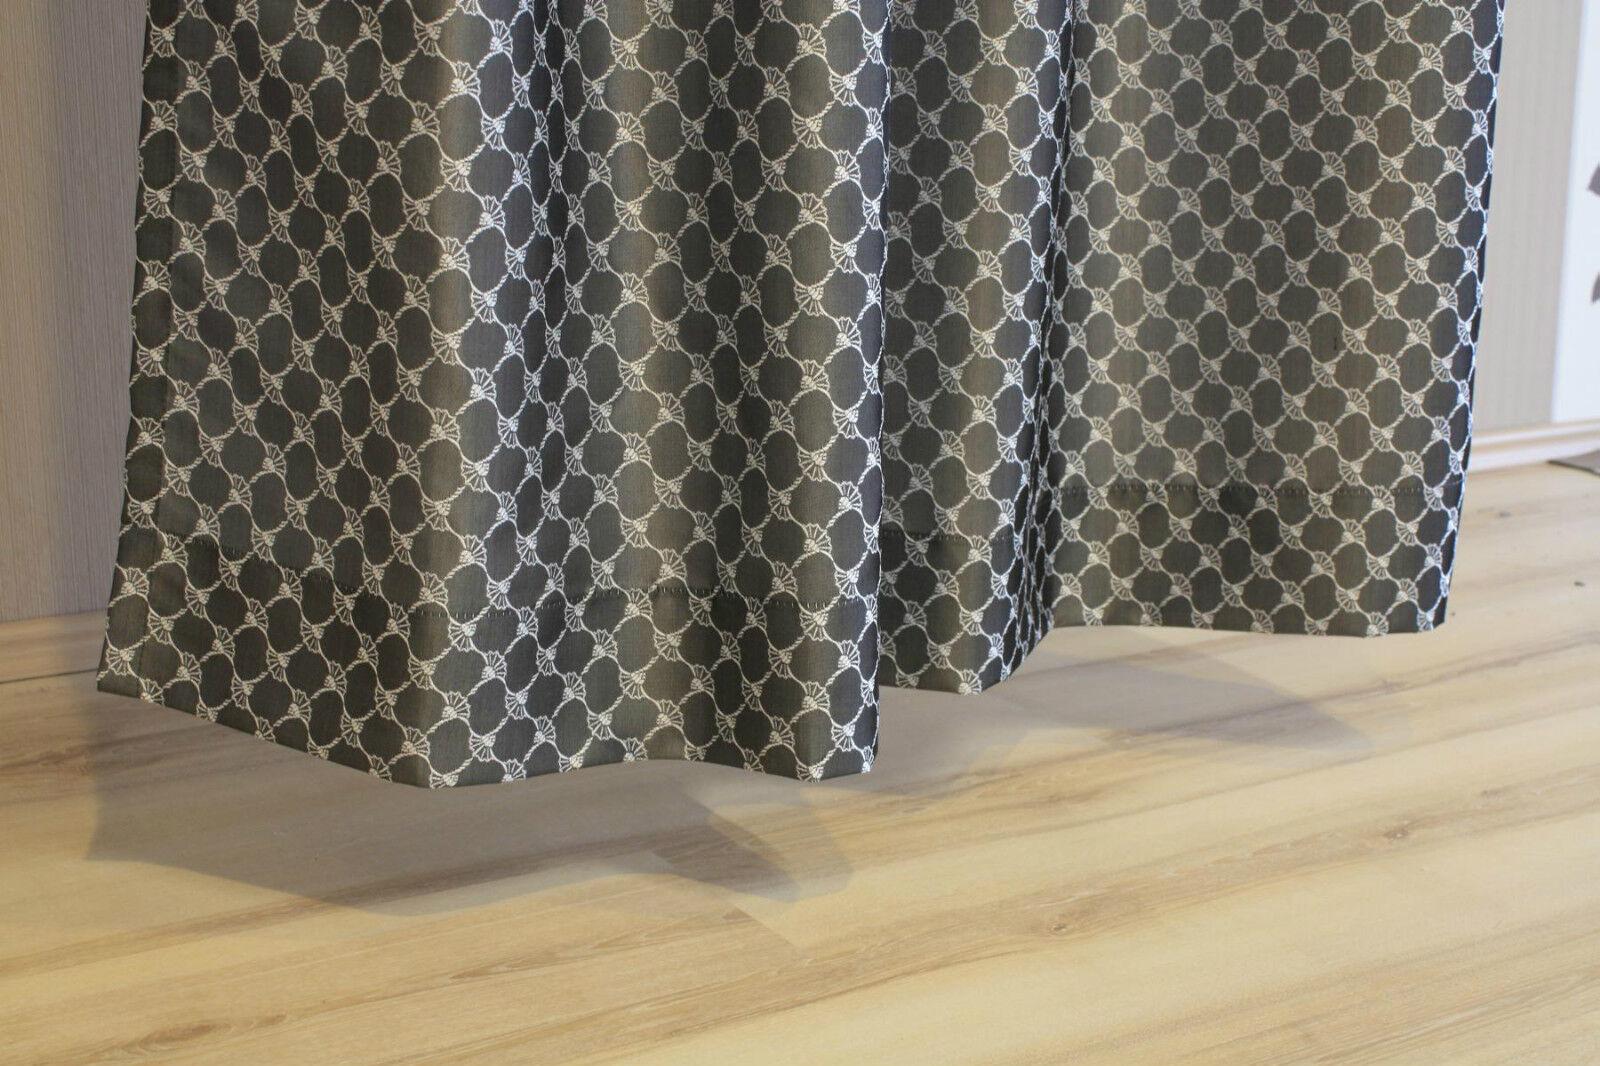 joop gardine vorhang senschal allover 010 grau 140x250 cm fertigschal eur 66 45 picclick de. Black Bedroom Furniture Sets. Home Design Ideas